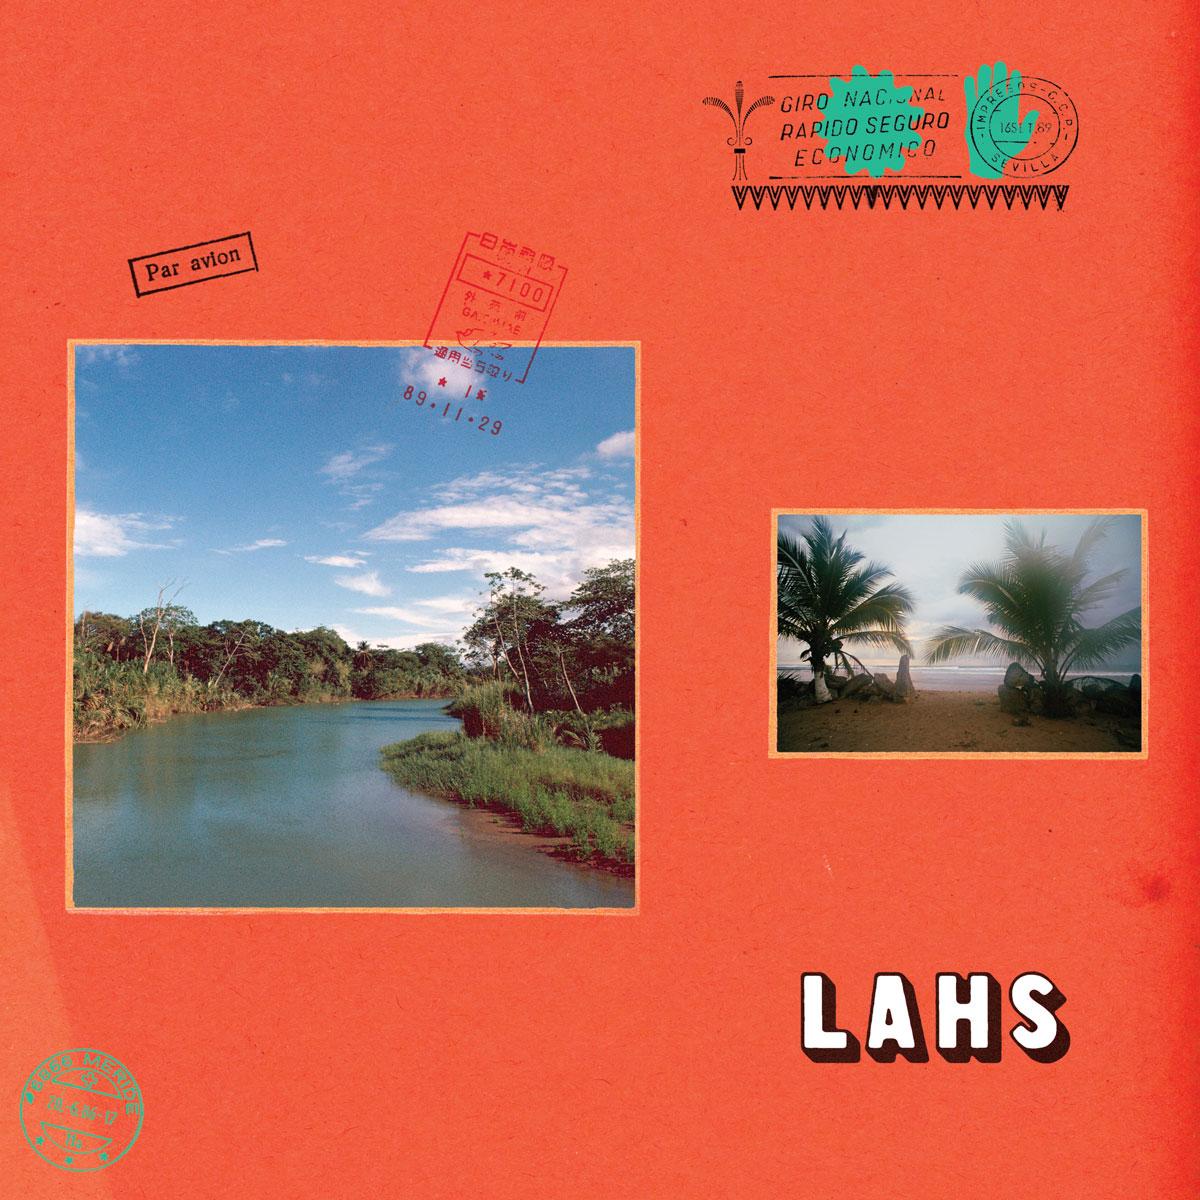 News – Allah Las – LAHS